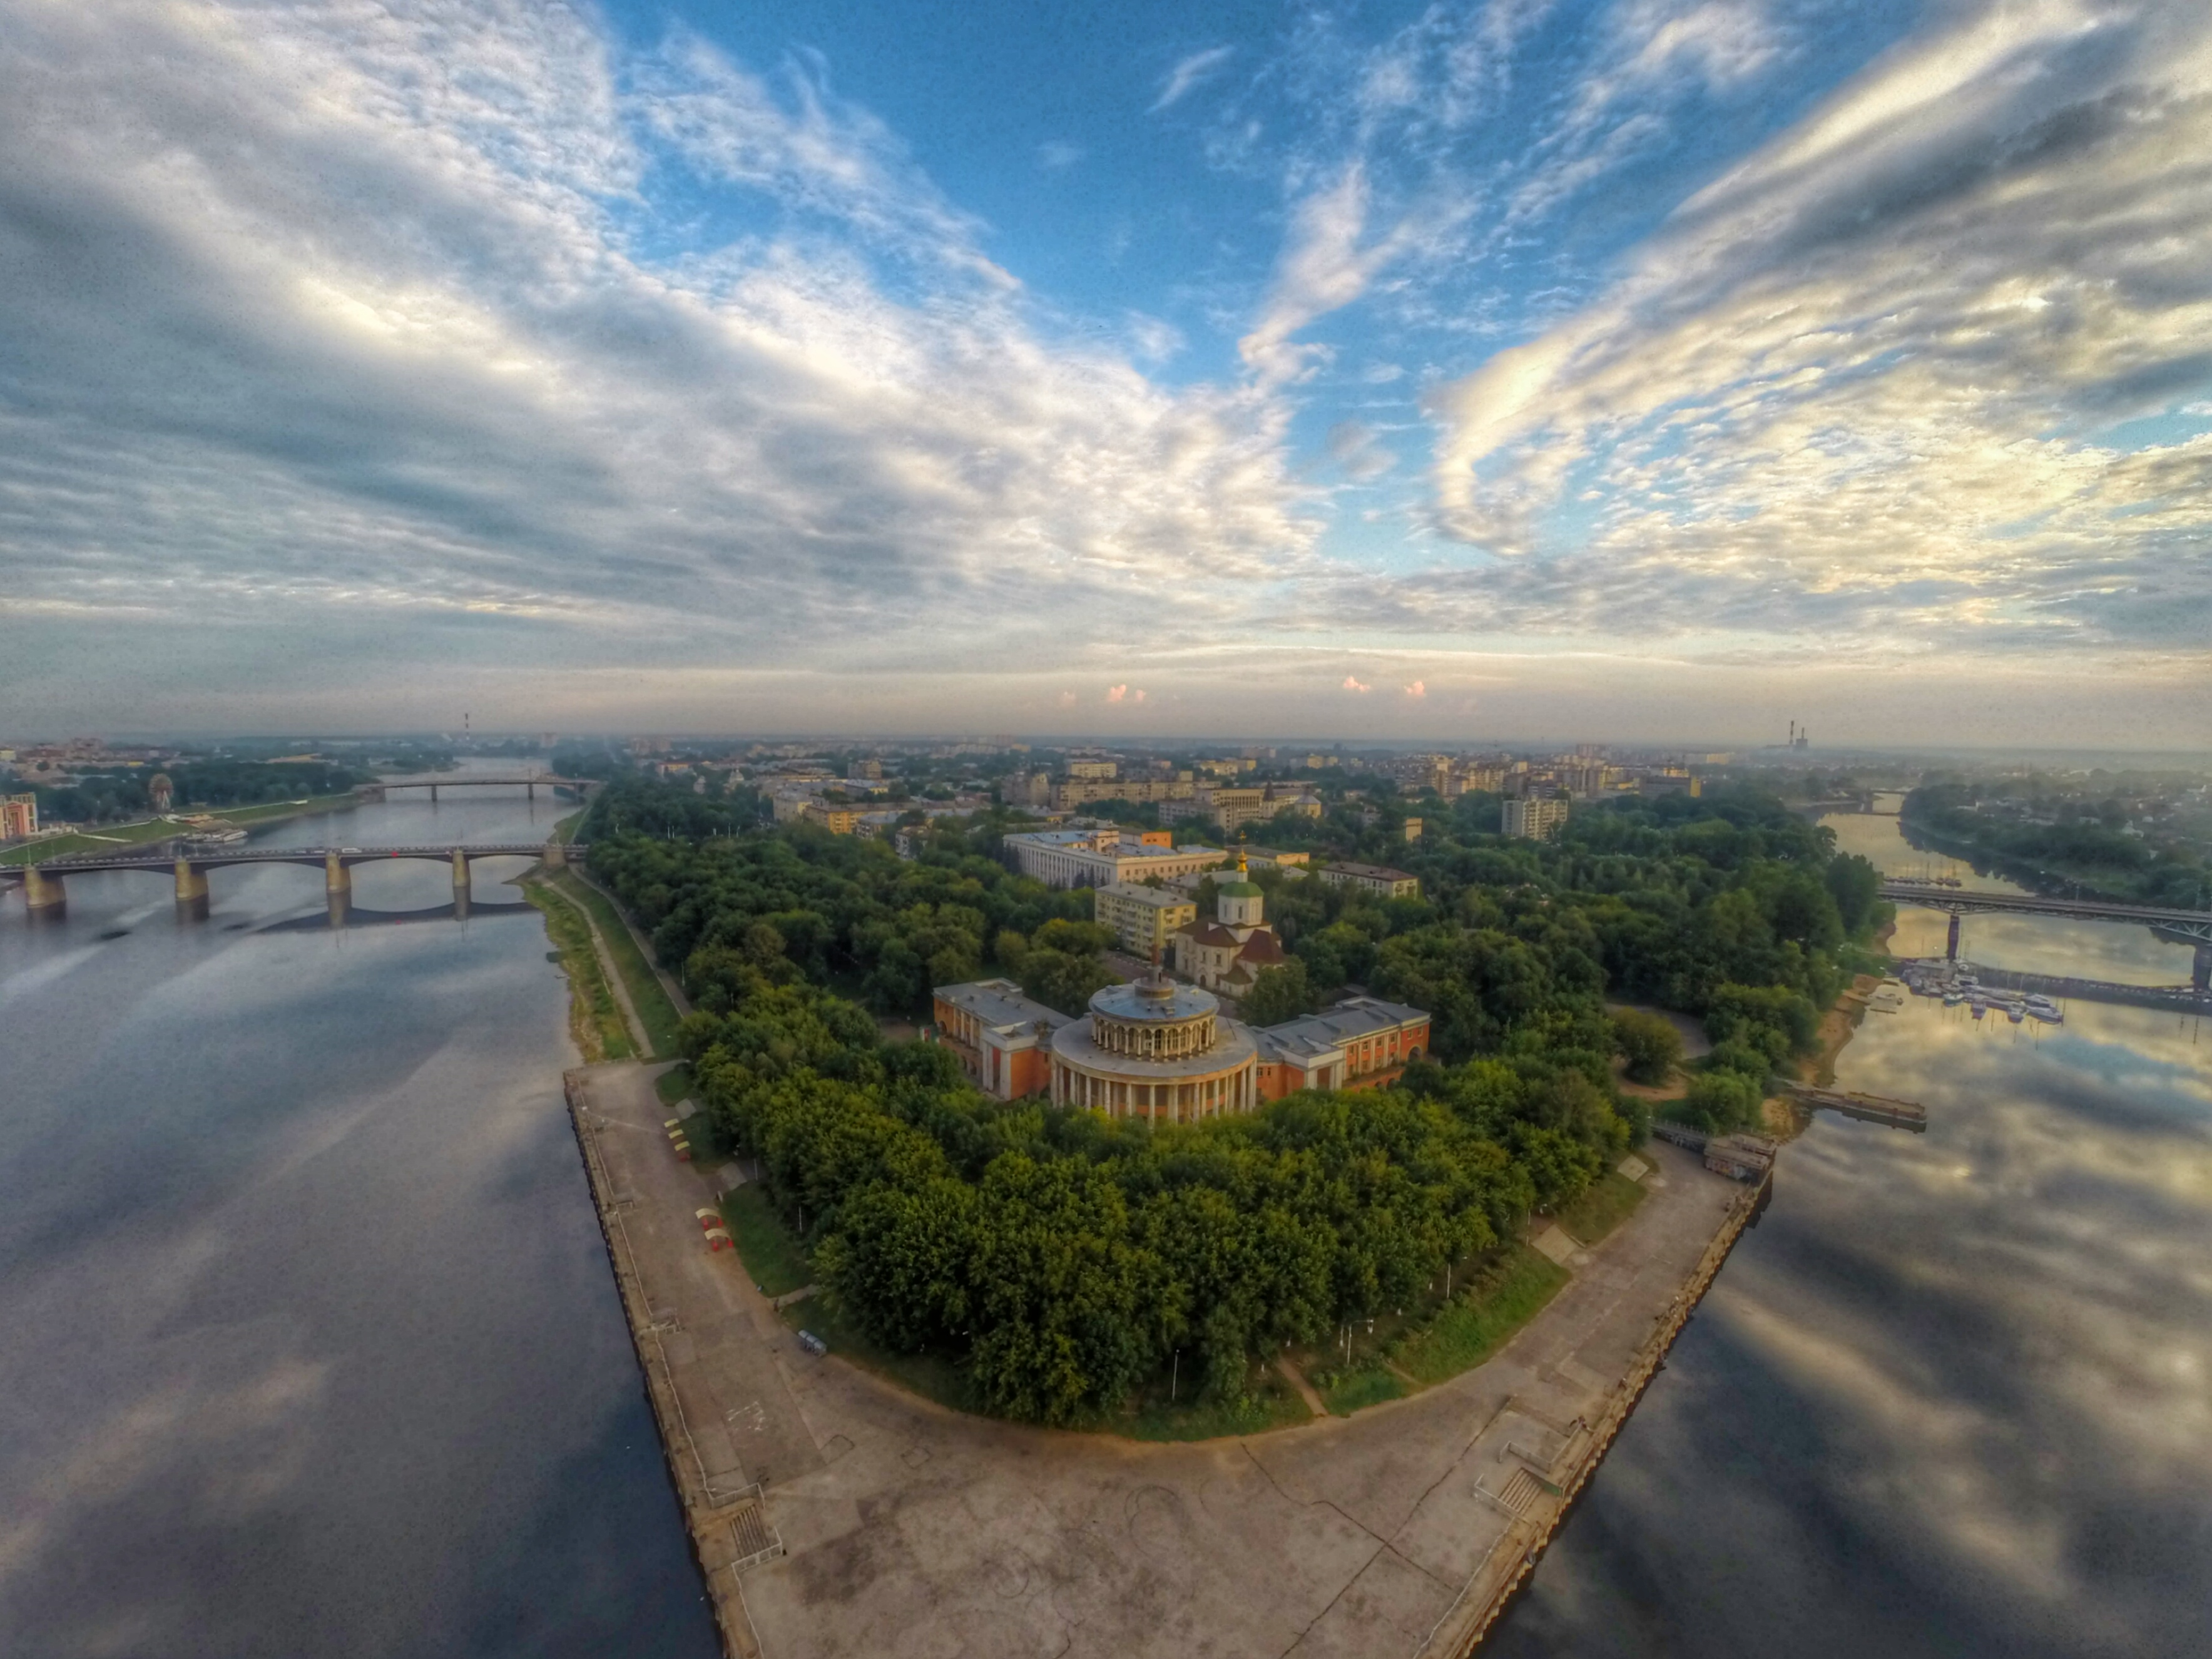 Tver, Russian Federation